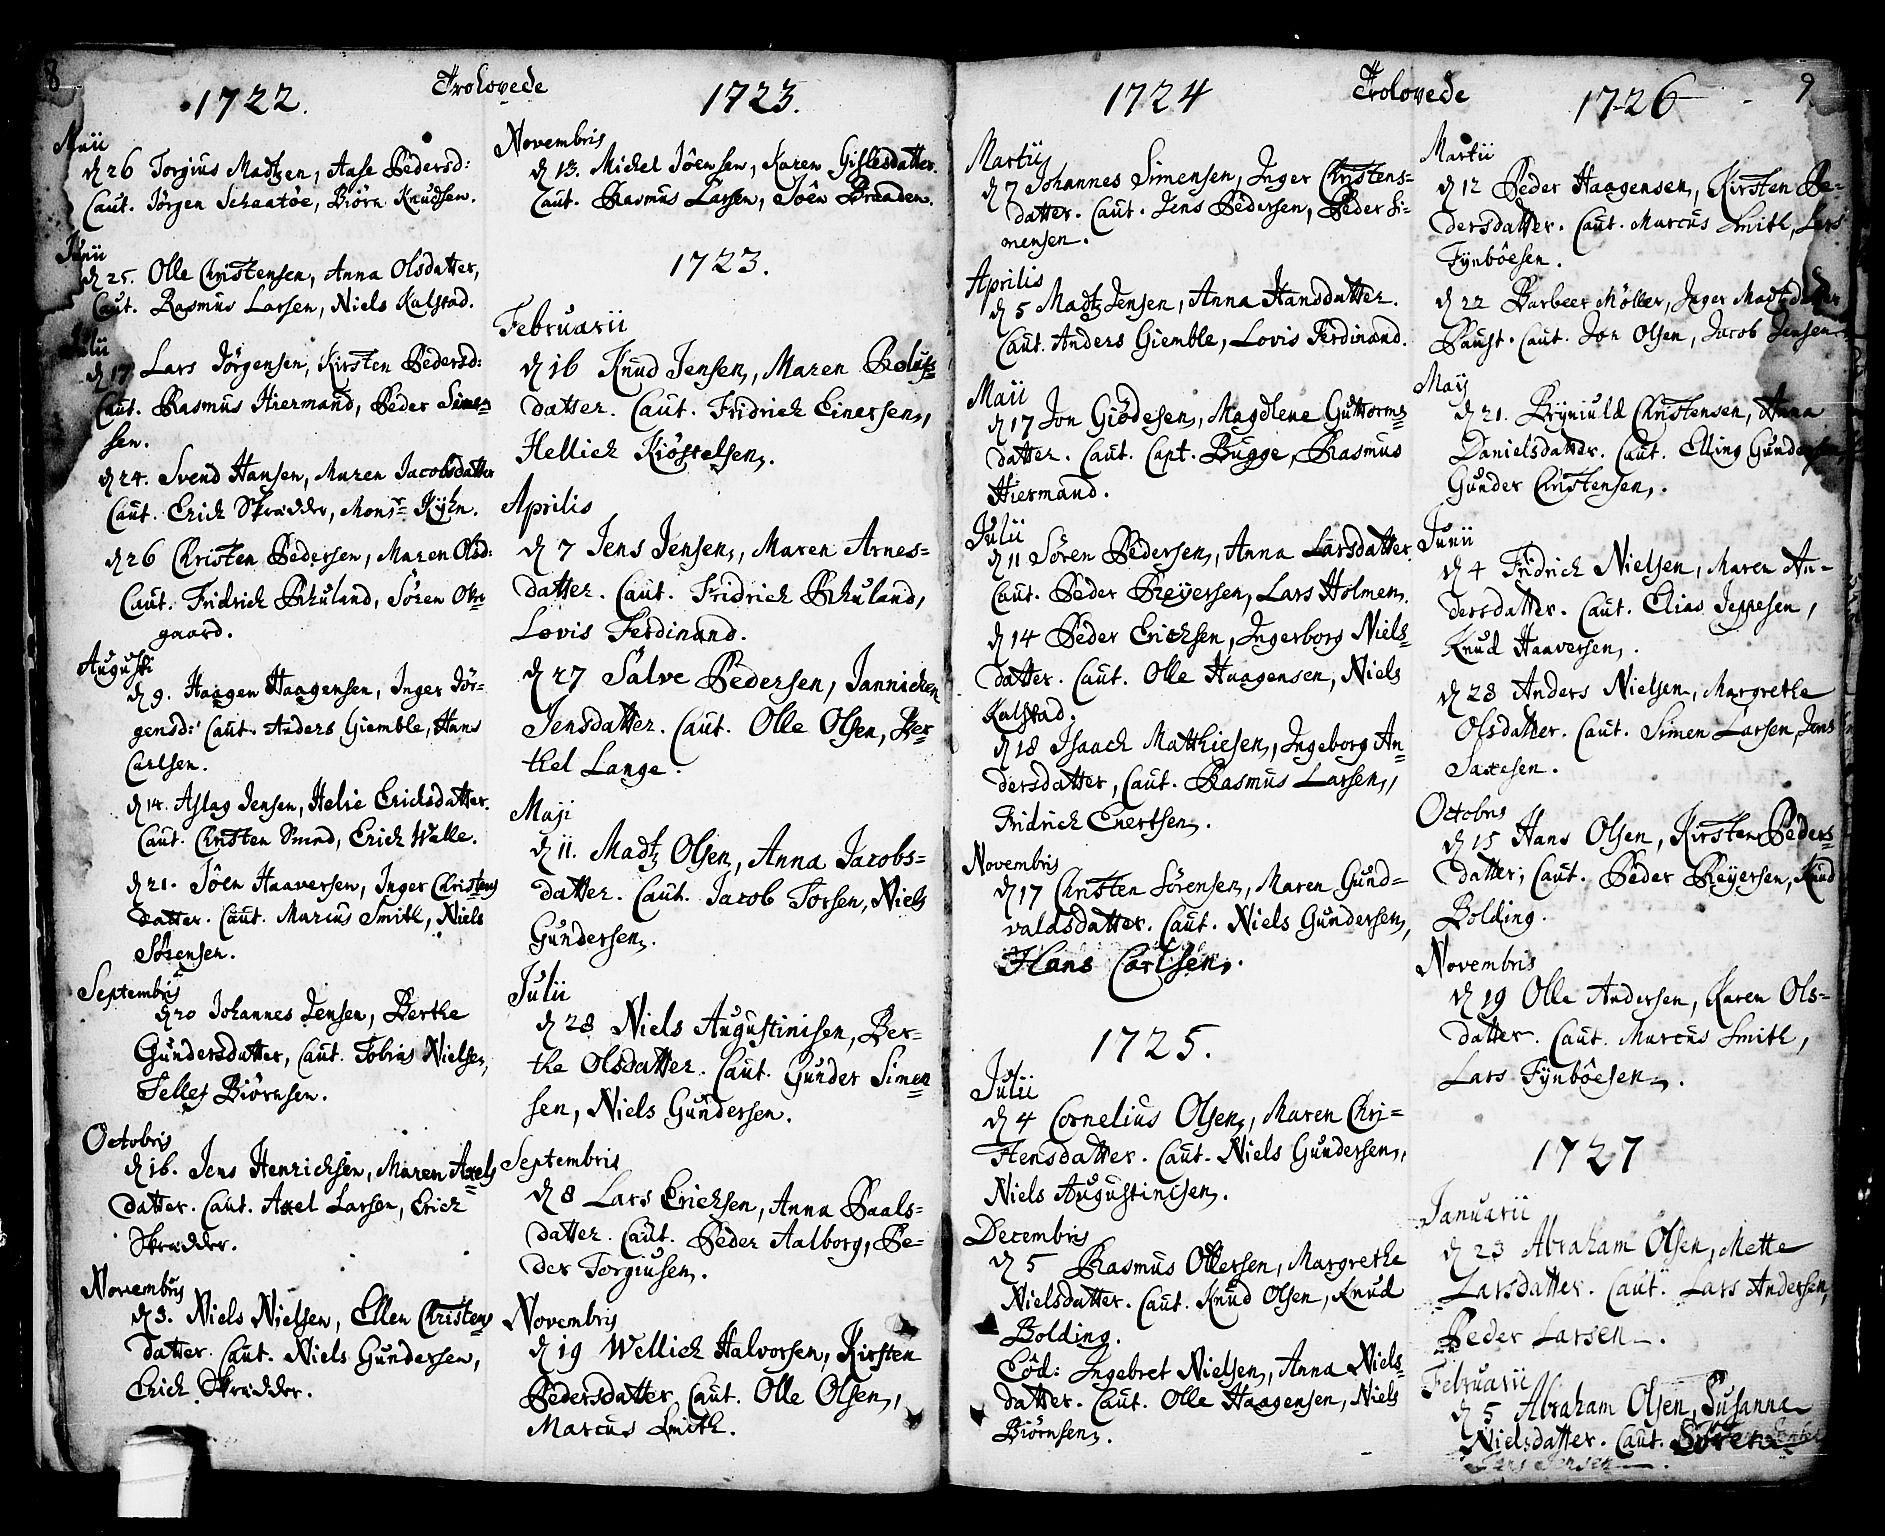 SAKO, Kragerø kirkebøker, F/Fa/L0001: Ministerialbok nr. 1, 1702-1766, s. 8-9